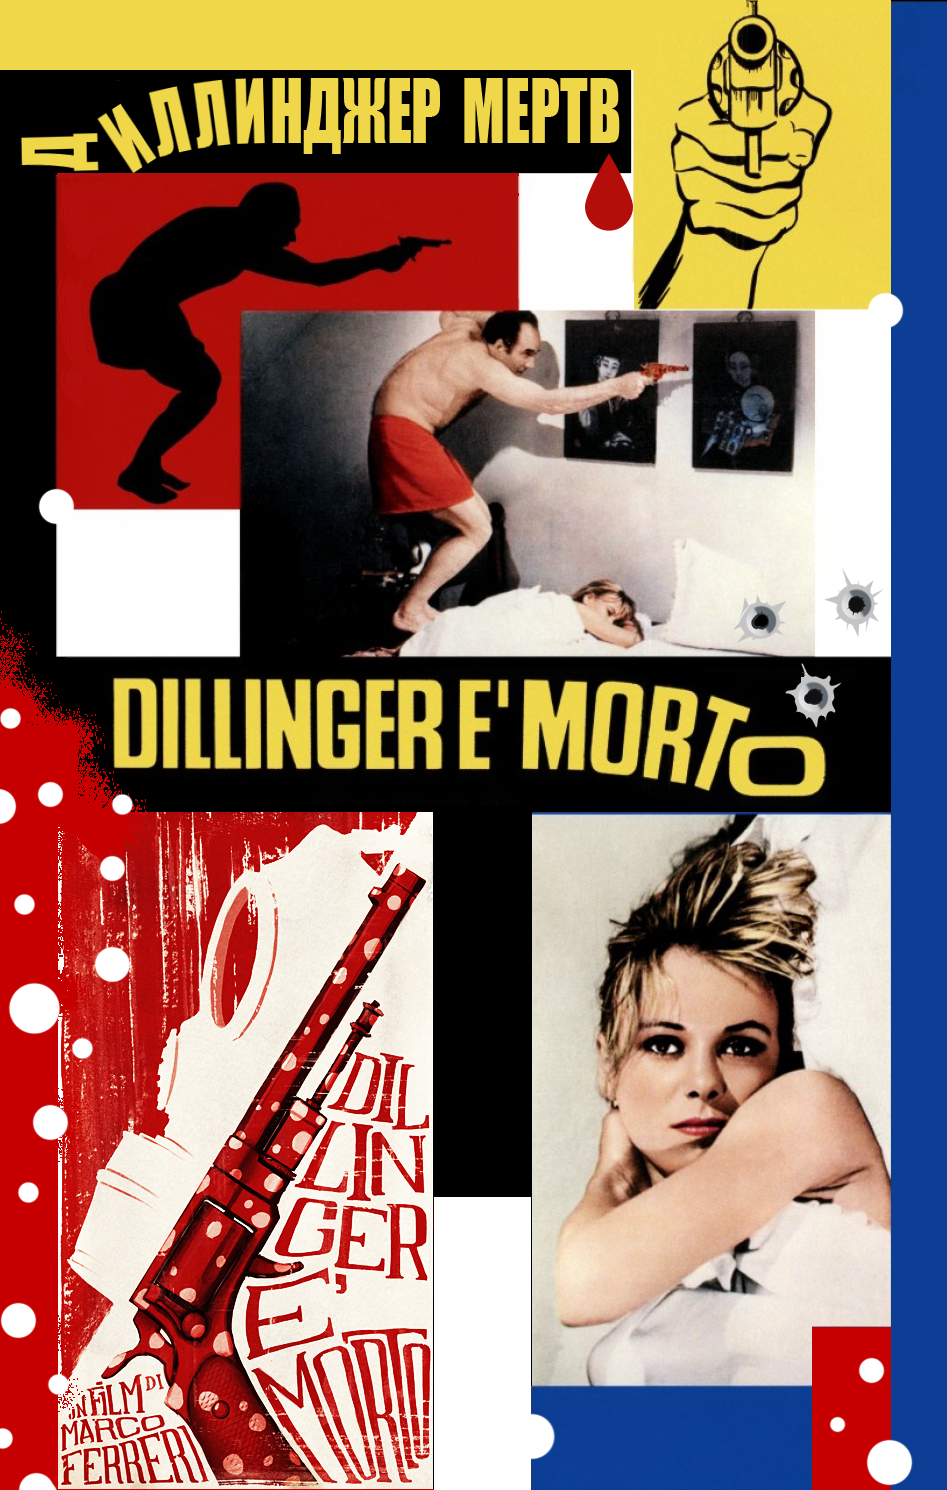 Диллинджер мертв - Dillinger ГЁ morto